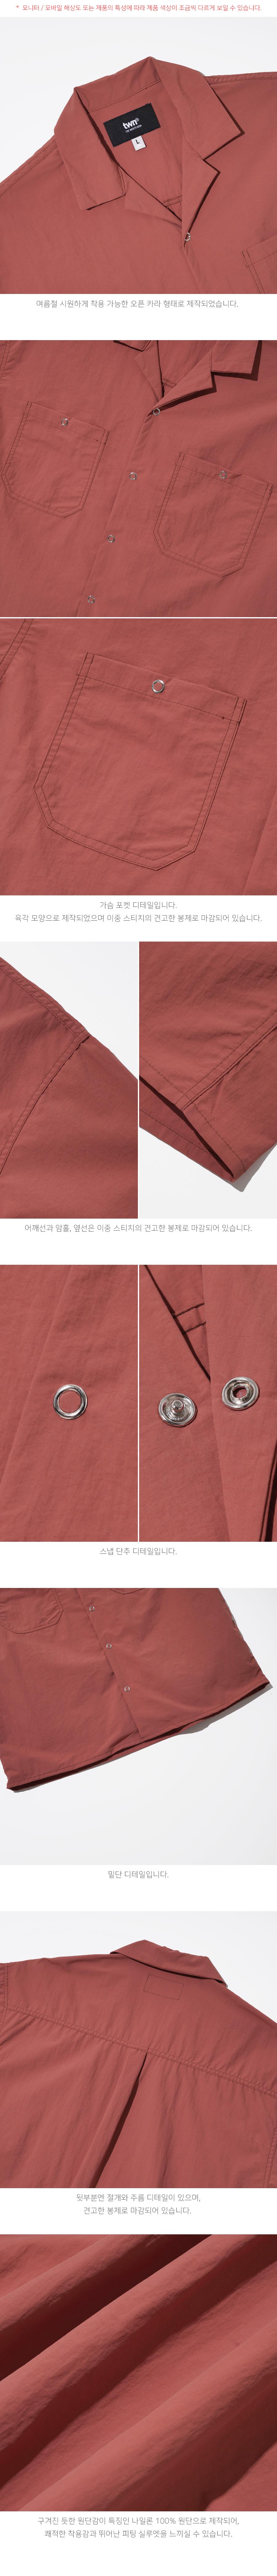 20200325_twn_ferment_set_detail_shirts_lm_02.jpg